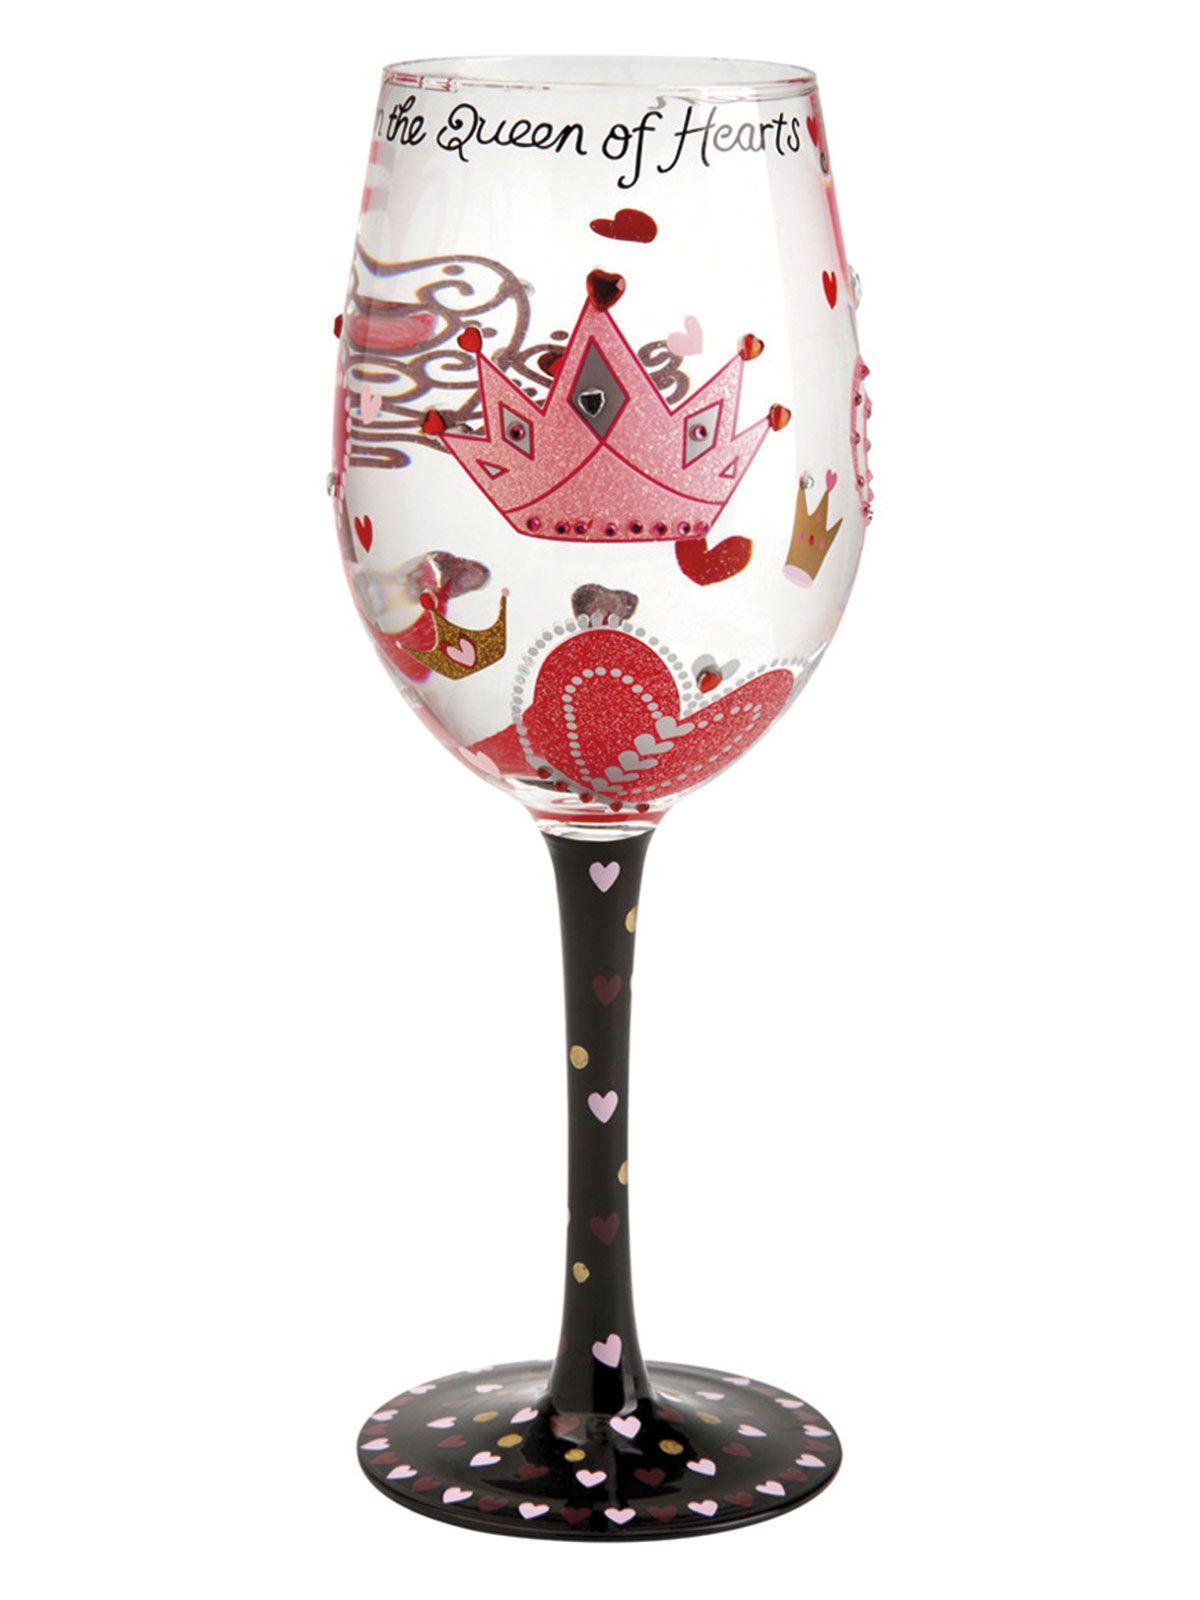 Copa de vino Queen of Hearts